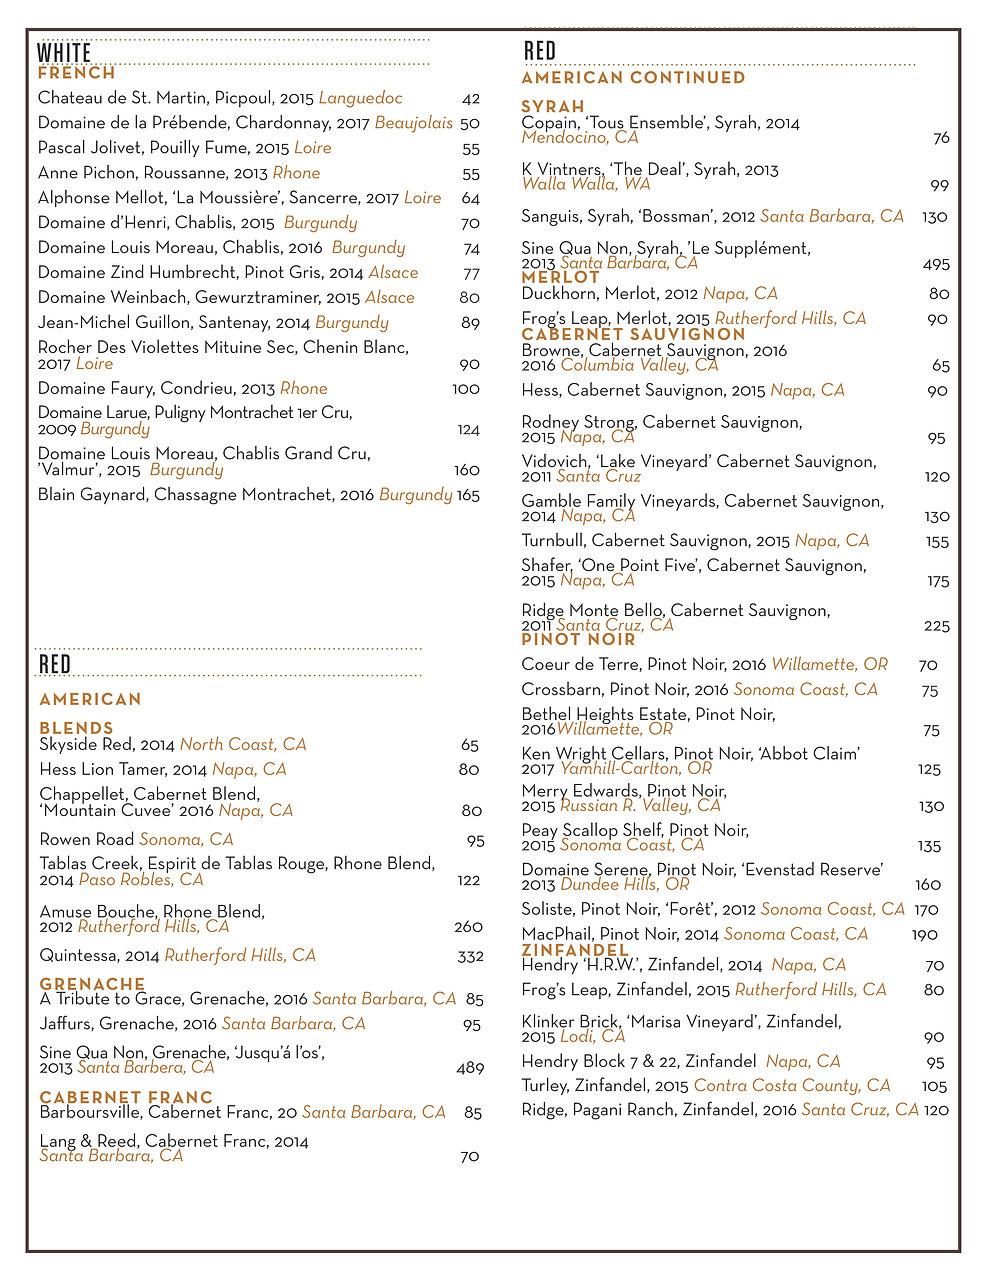 190829 Riggsby Wine List3.jpg